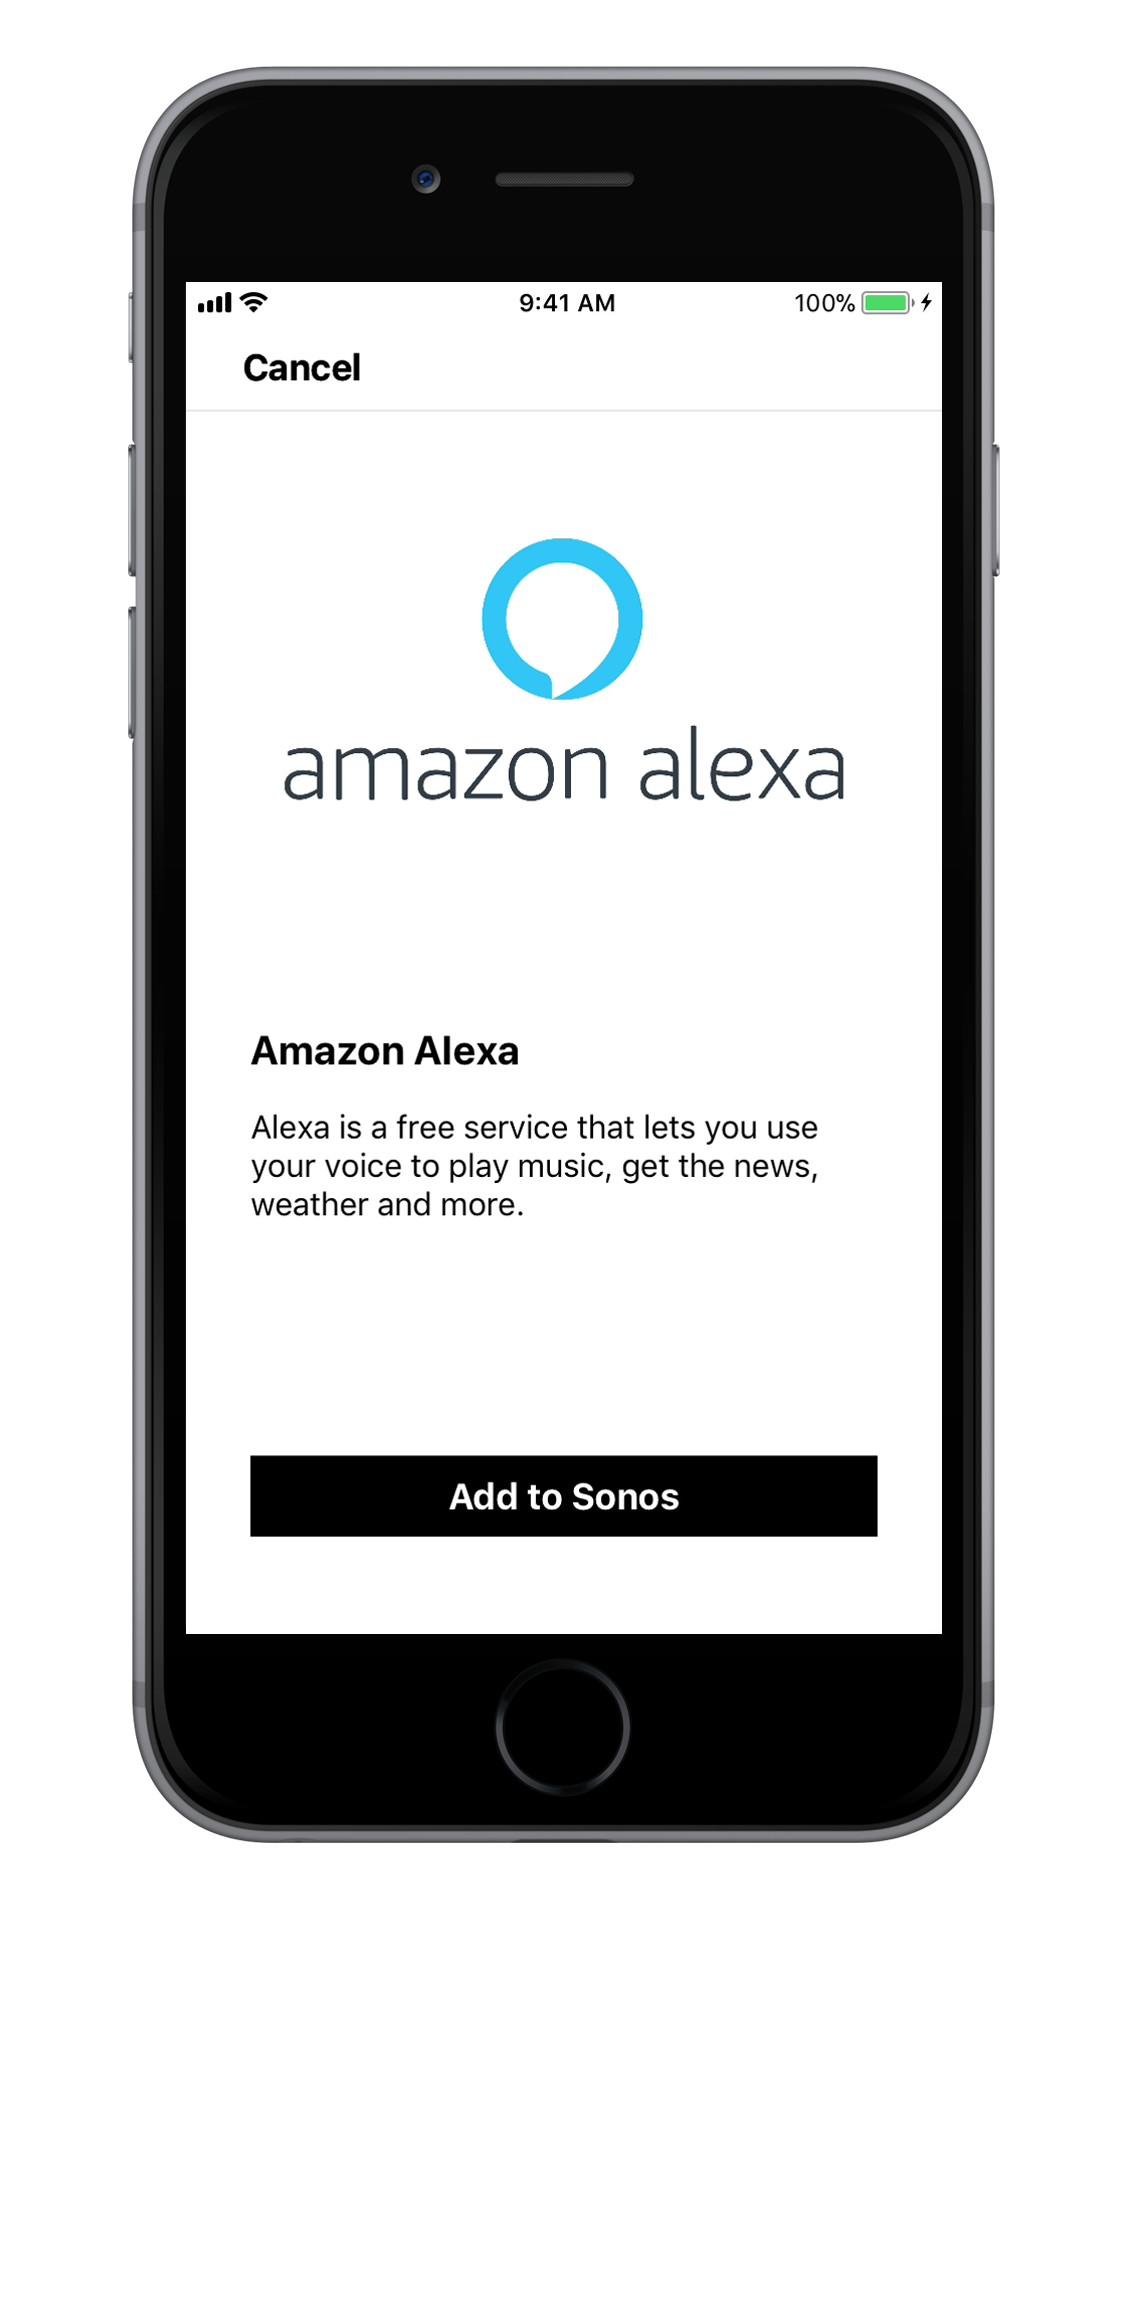 Amazon Alexa Is A Remote Control Device Which Controls The Amazon